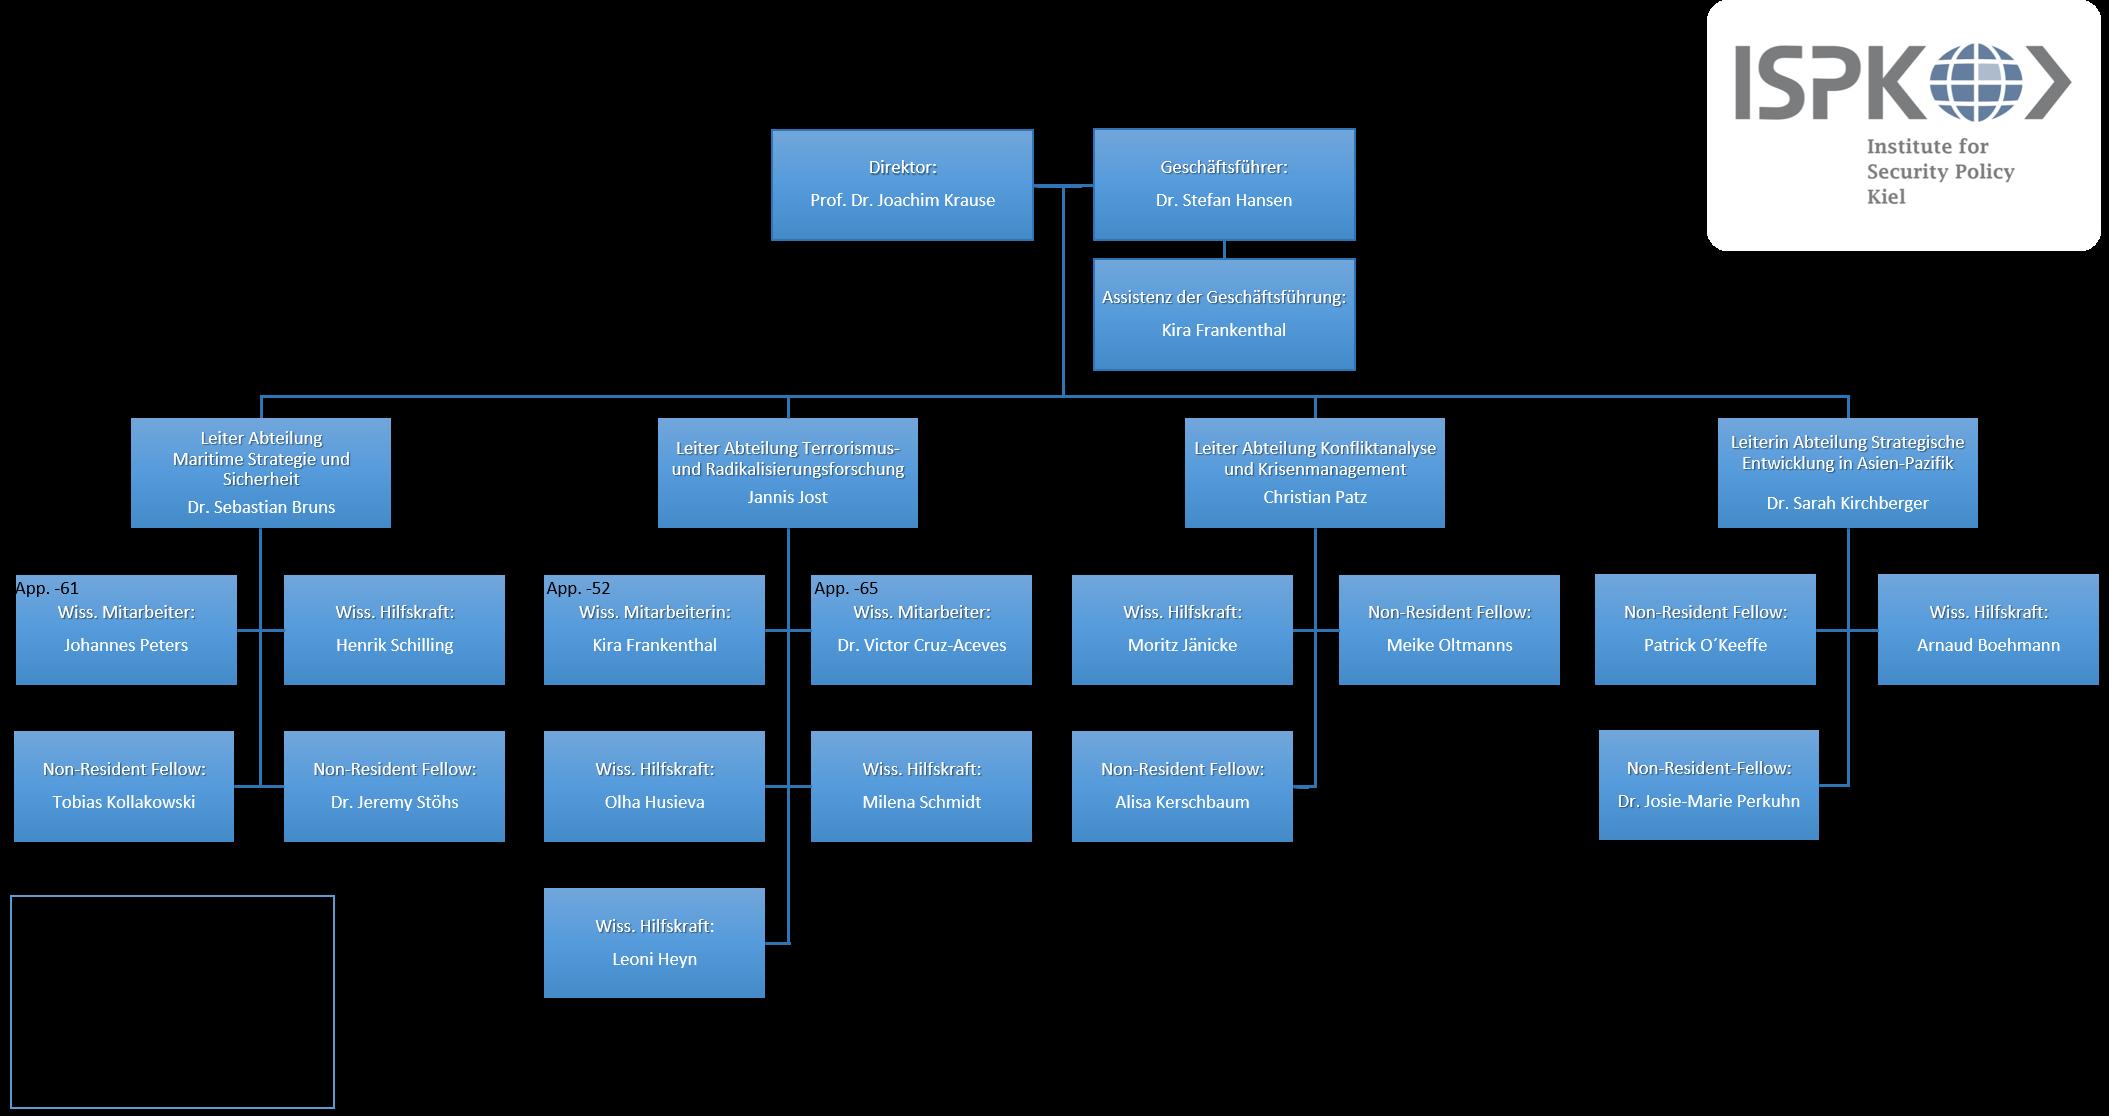 Organigramm des ISPK